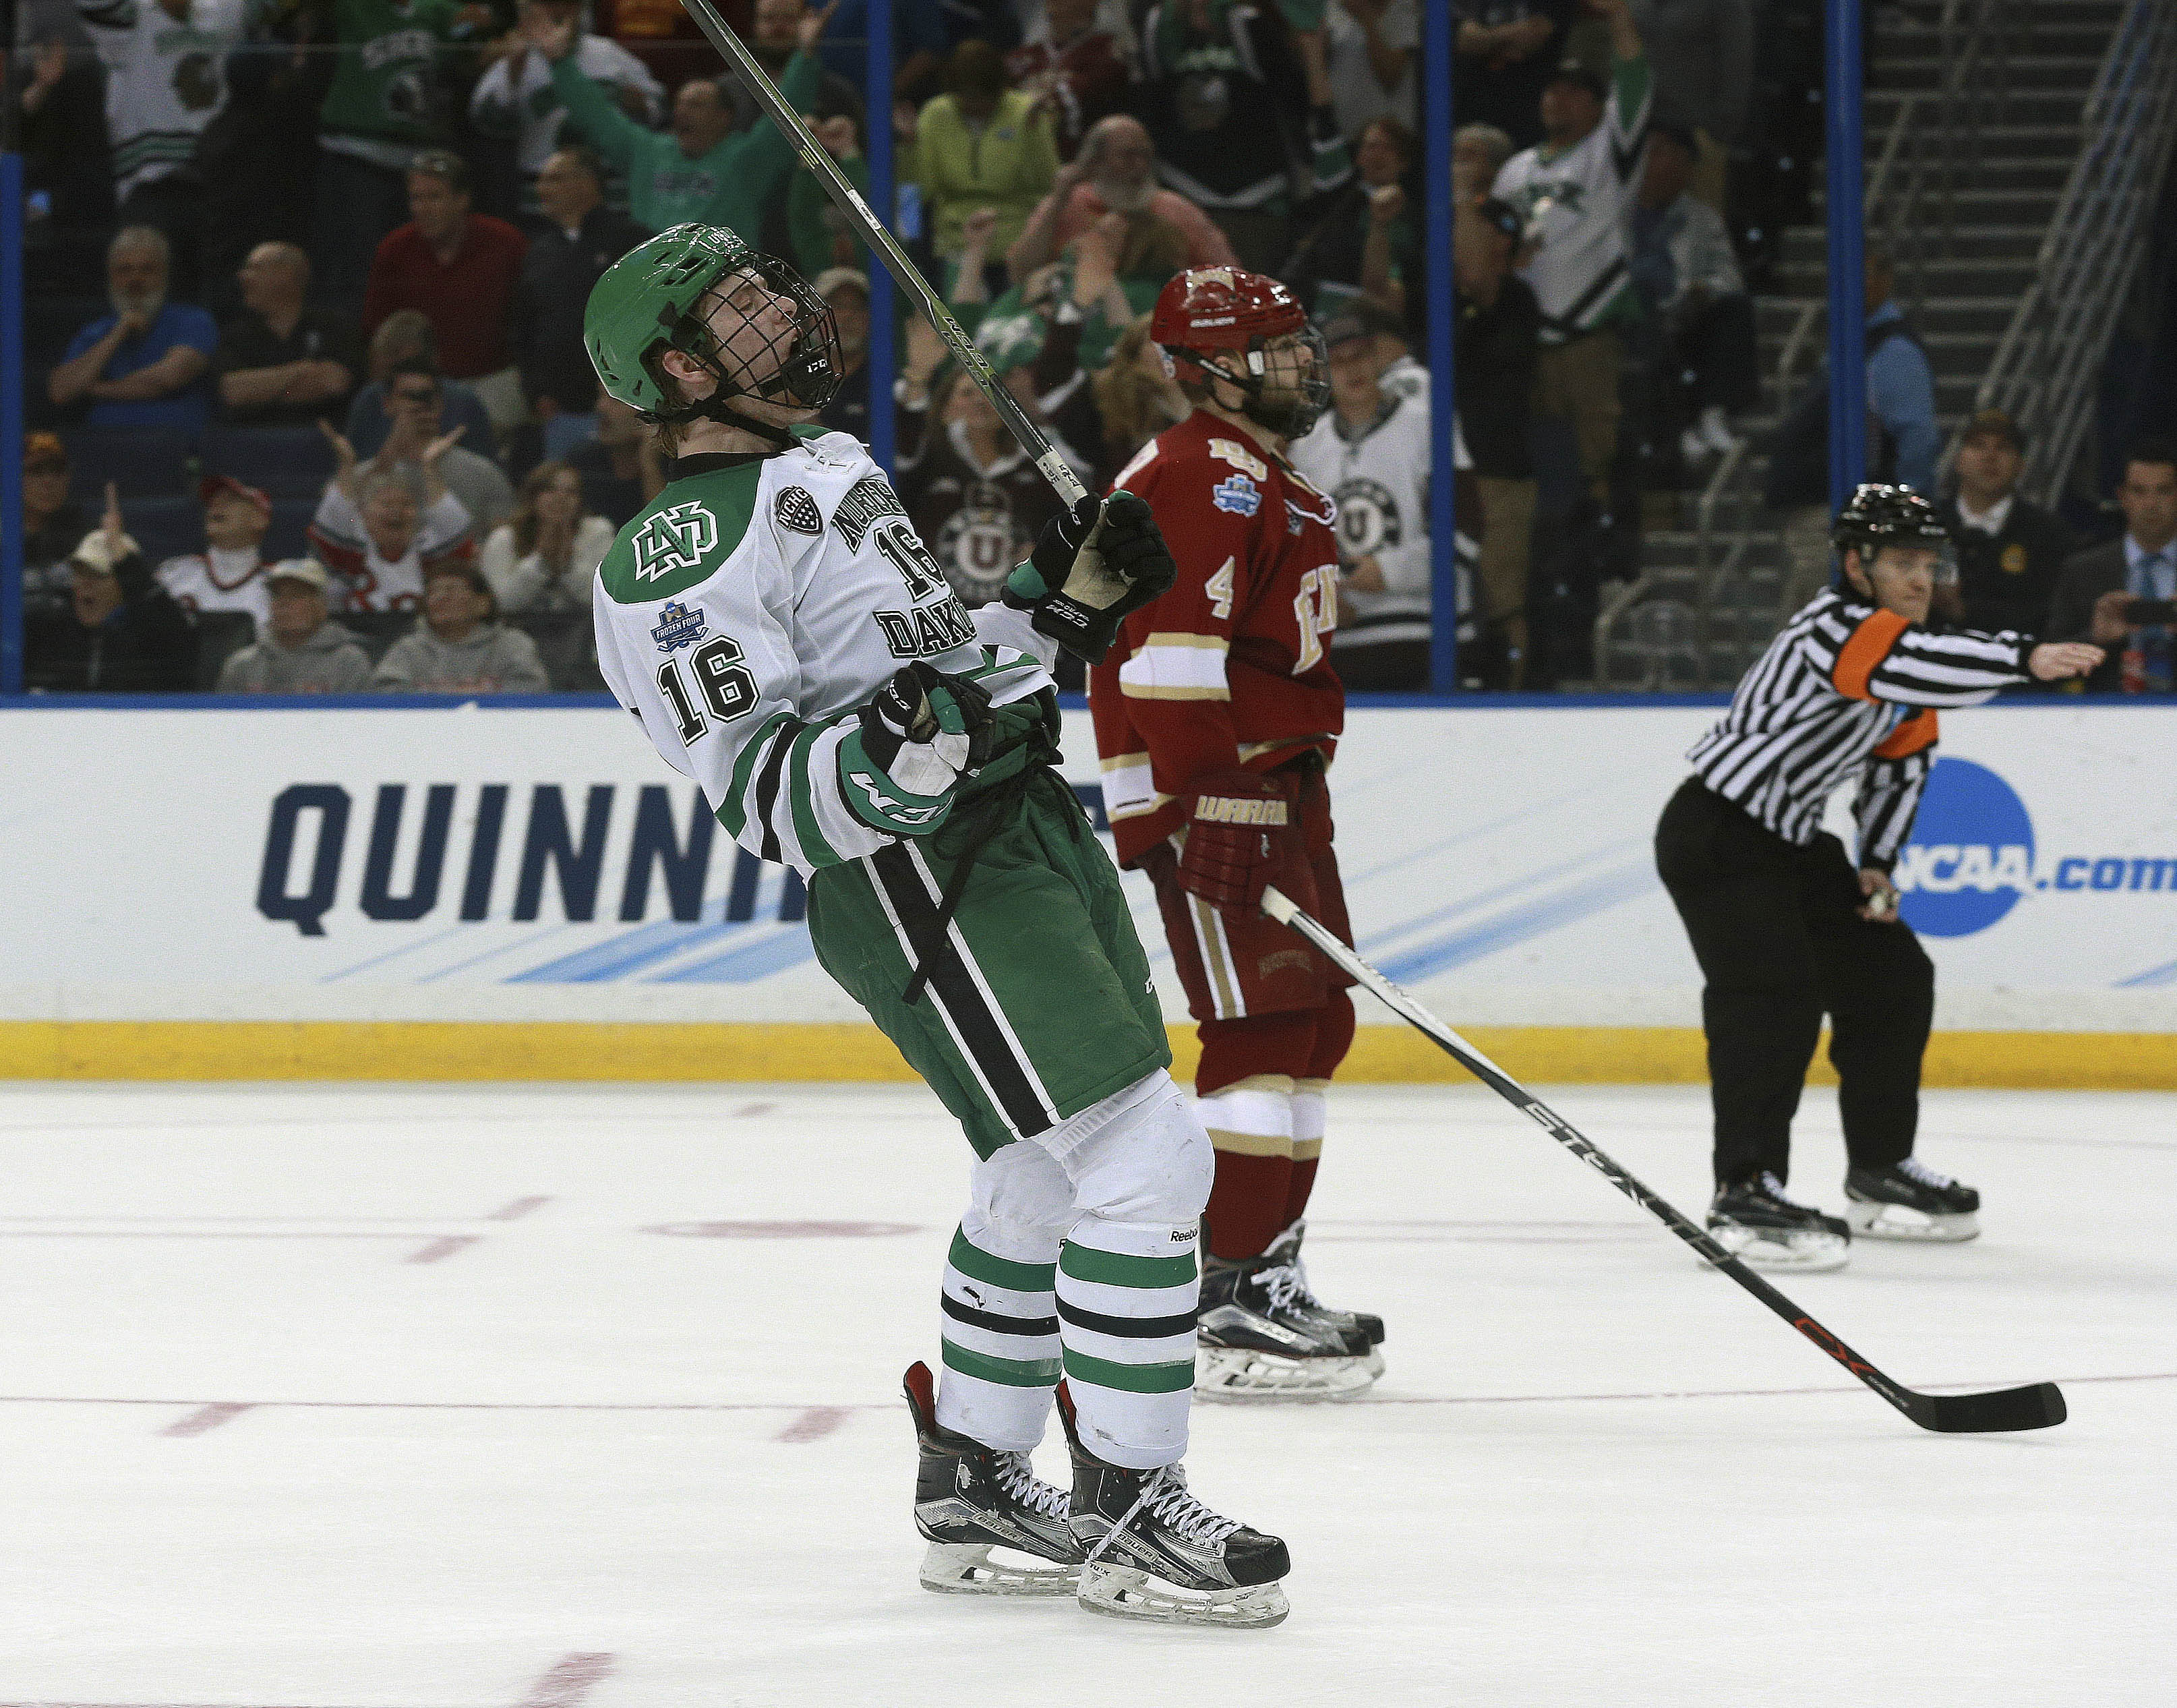 9236263-ncaa-hockey-frozen-four-denver-vs-north-dakota